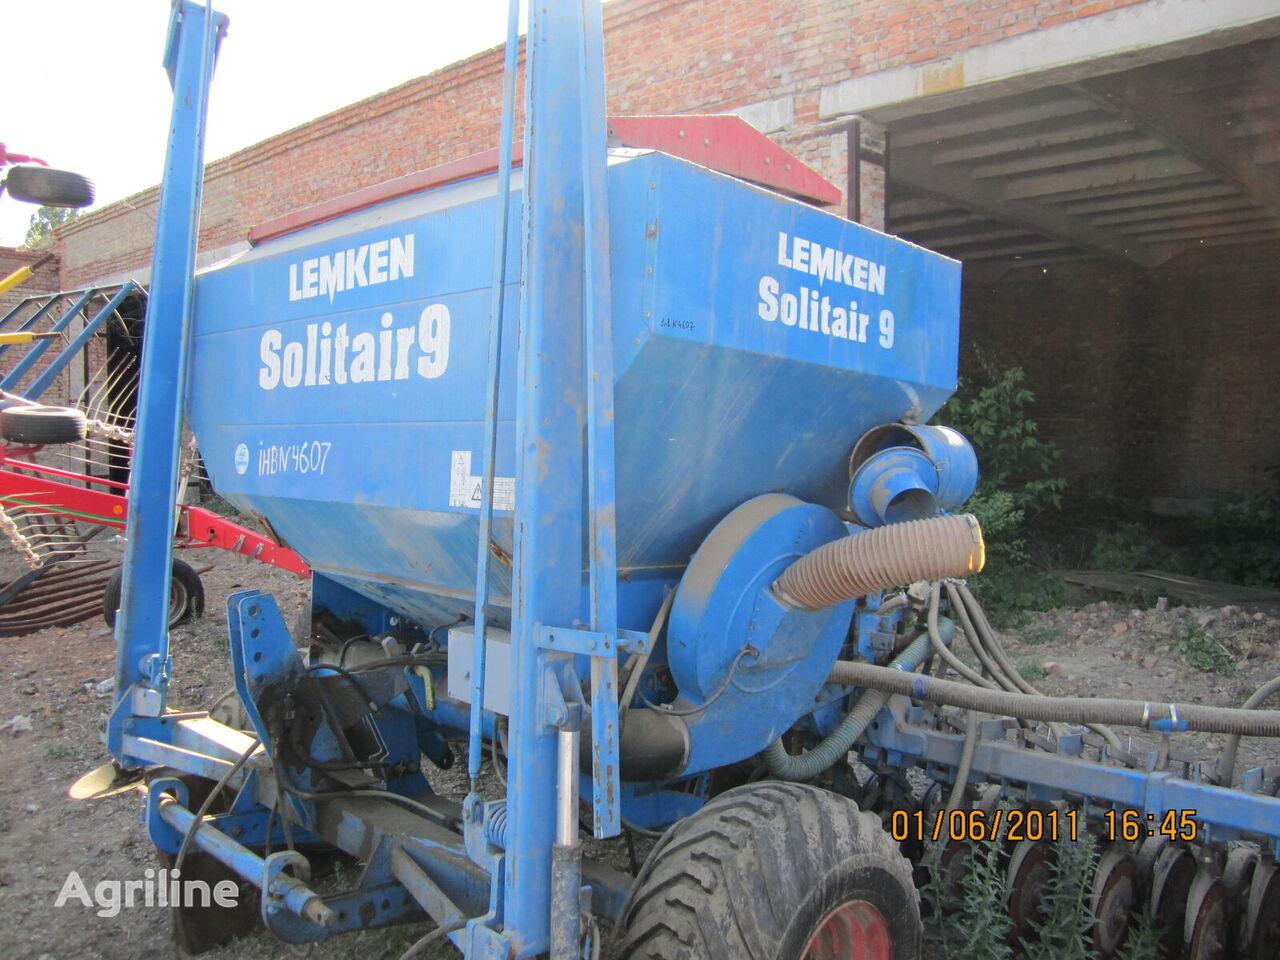 LEMKEN SOLITAIR 6 pneumatic seed drill